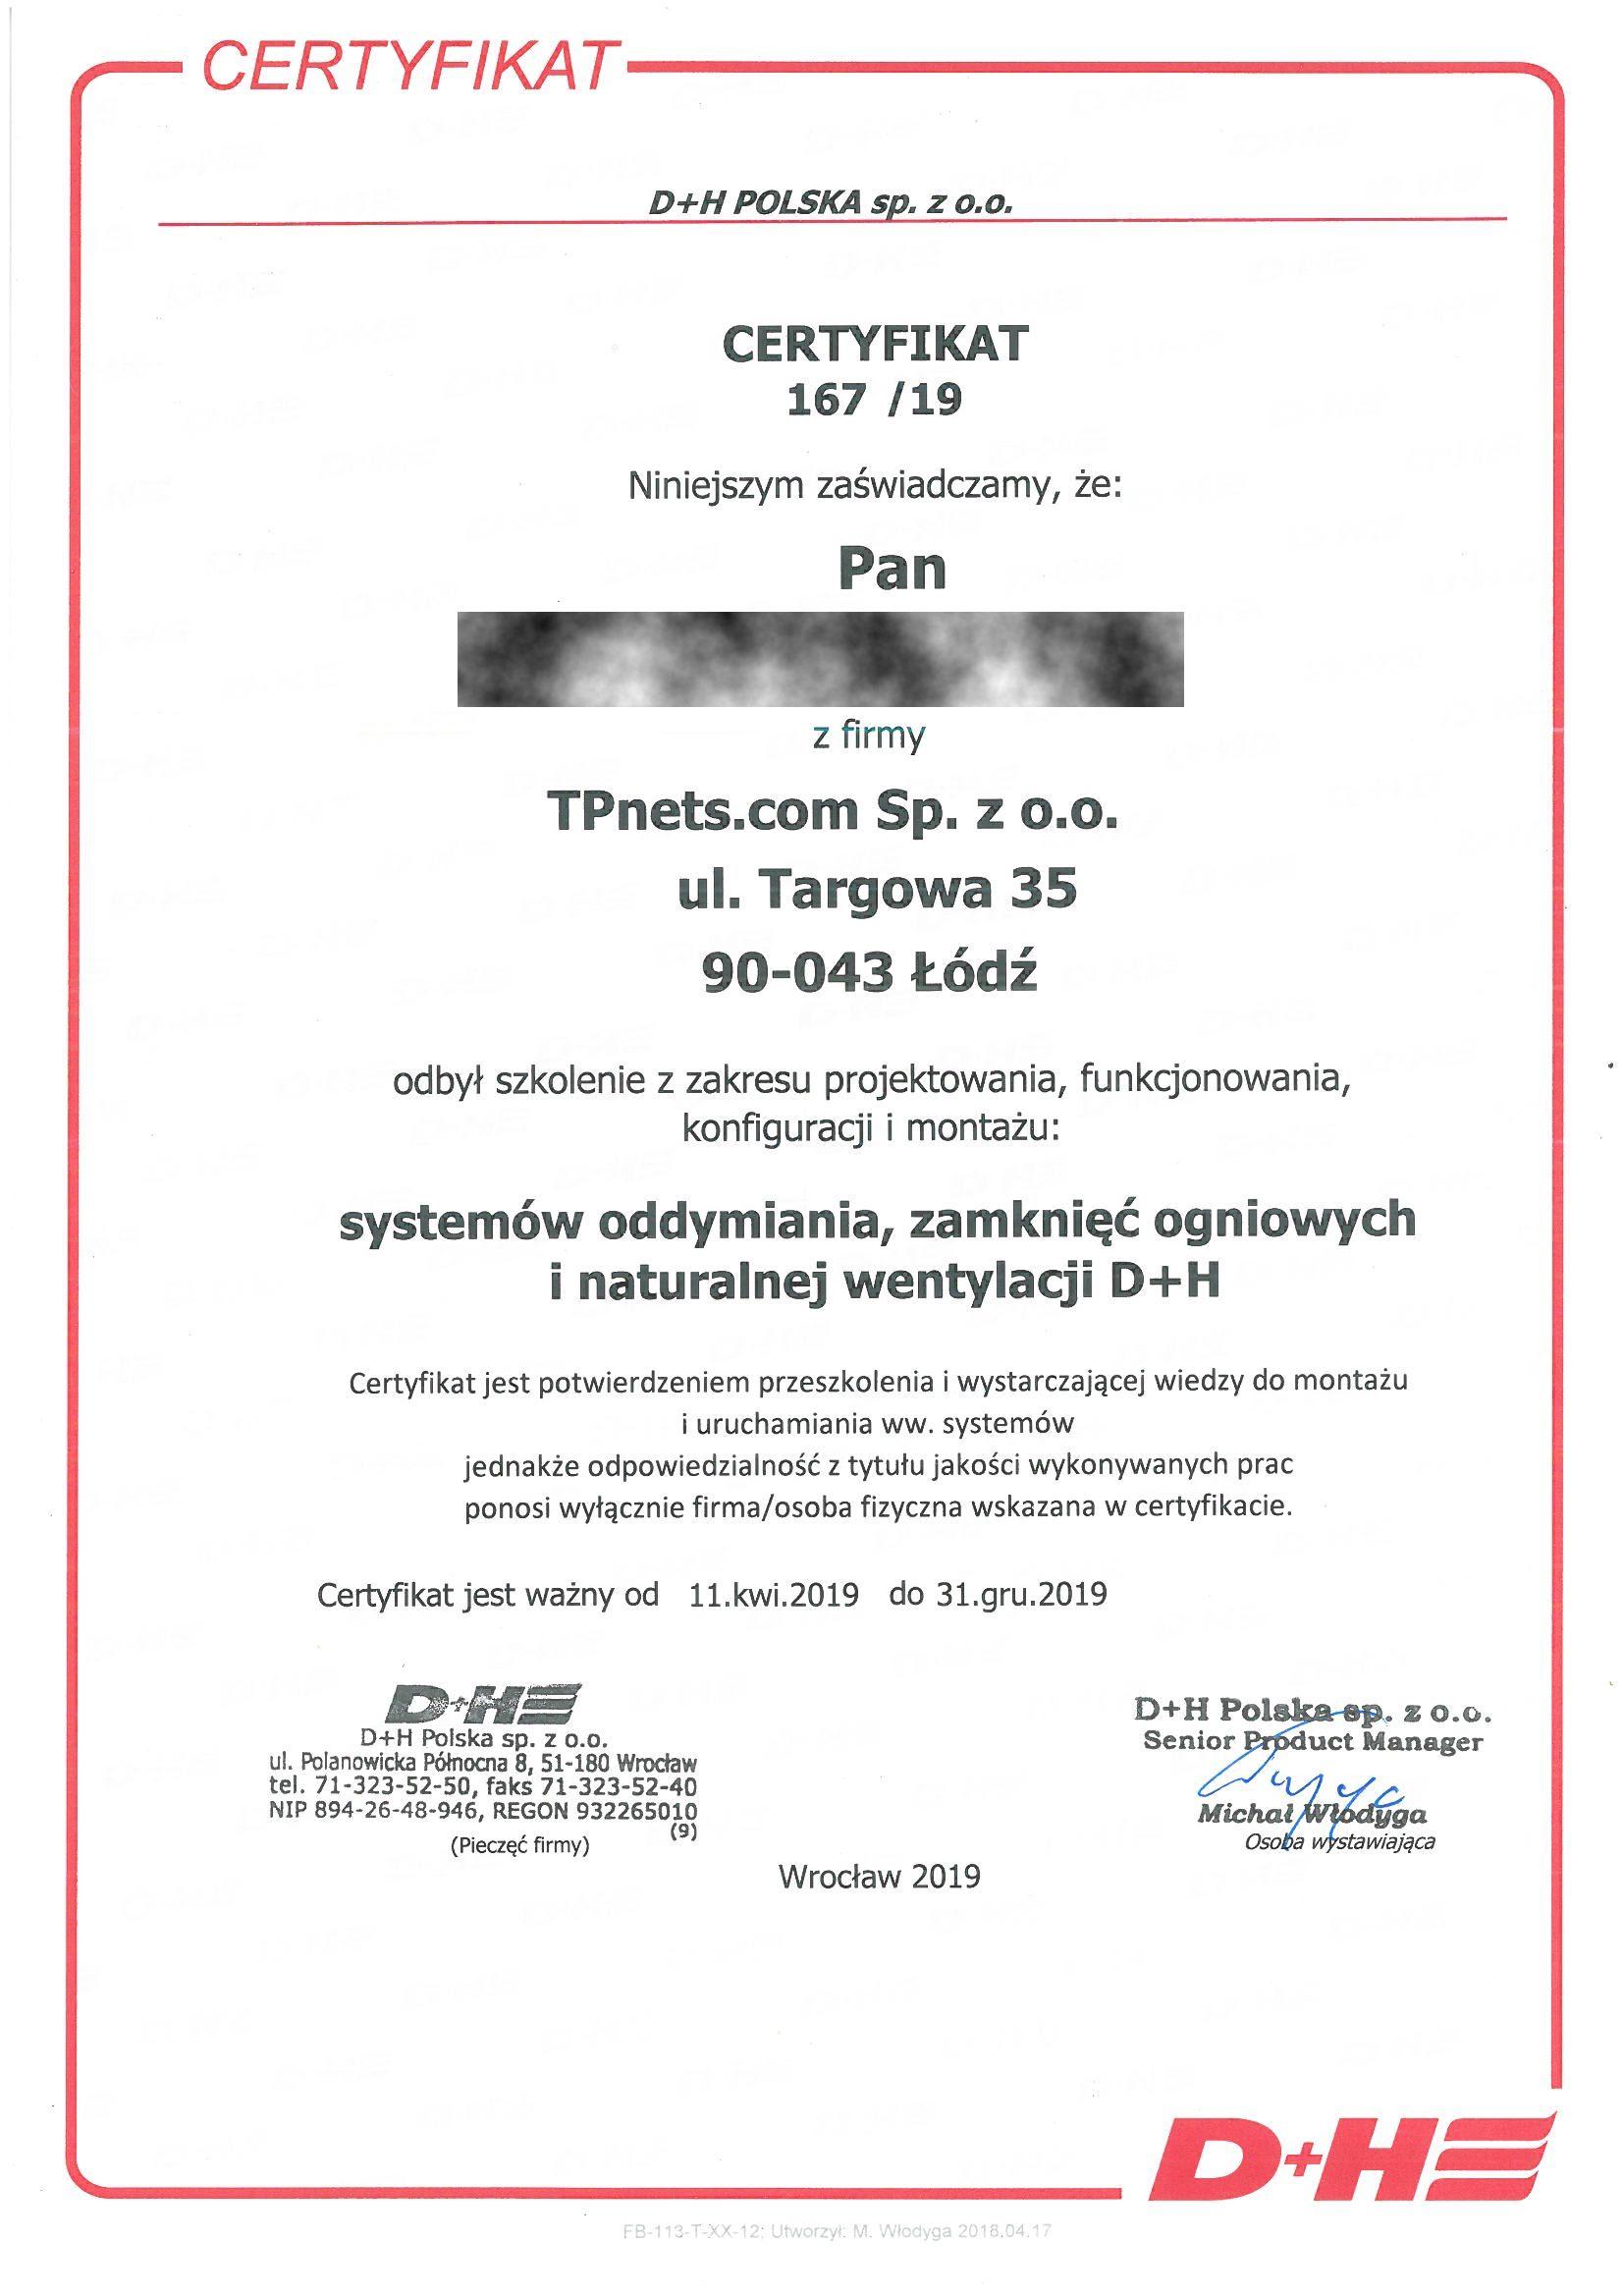 D+H POLSKA 2019 TB Szkol system oddymiania RODO